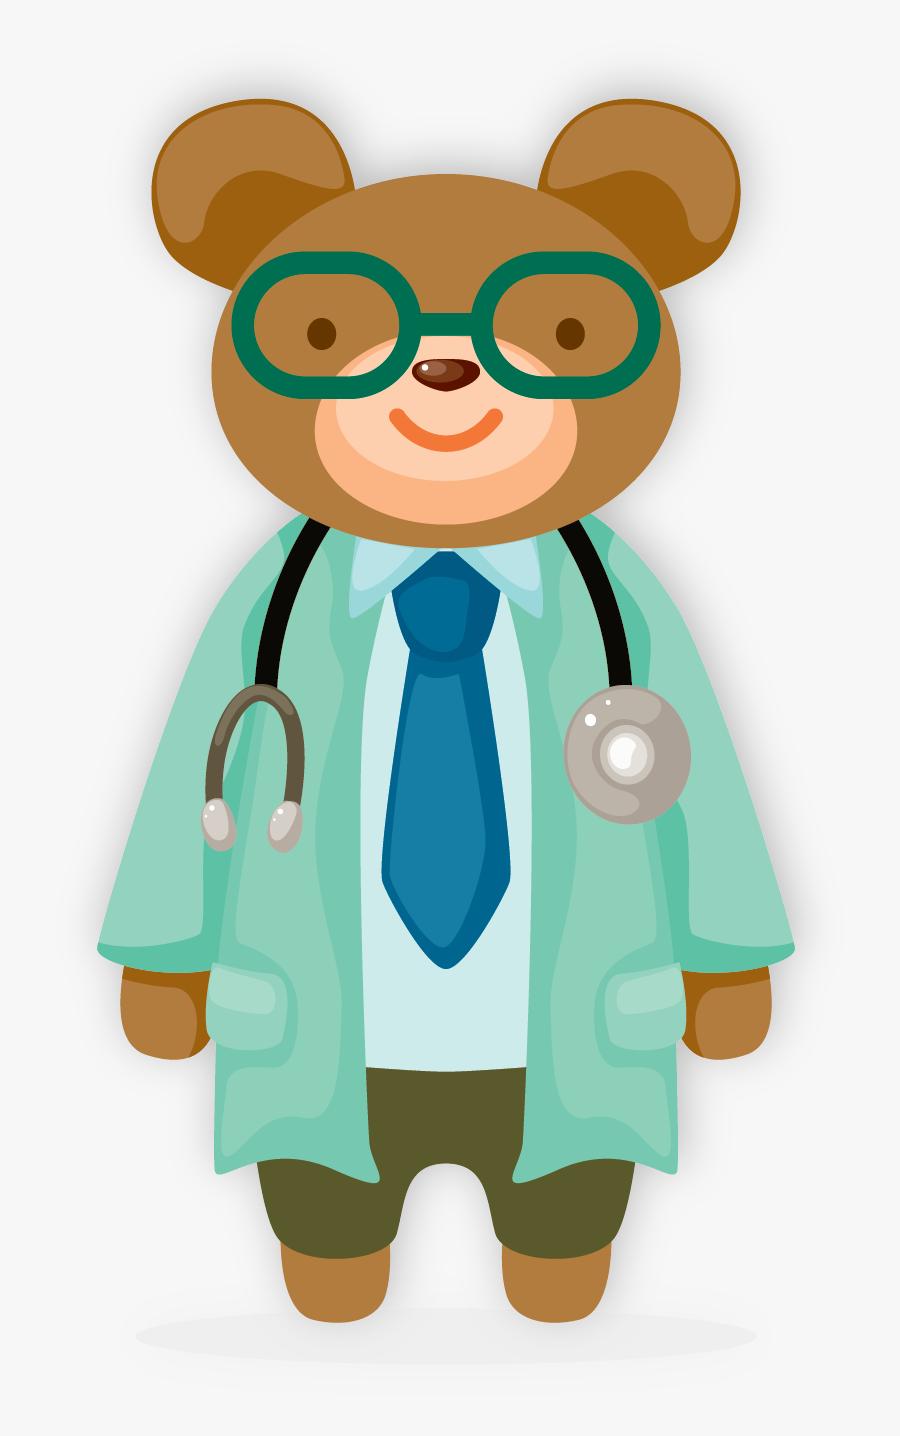 Clip Royalty Free Columbia Basin Pediatrics Pasco Wa - Animal Doctor Cartoon Clipart, Transparent Clipart